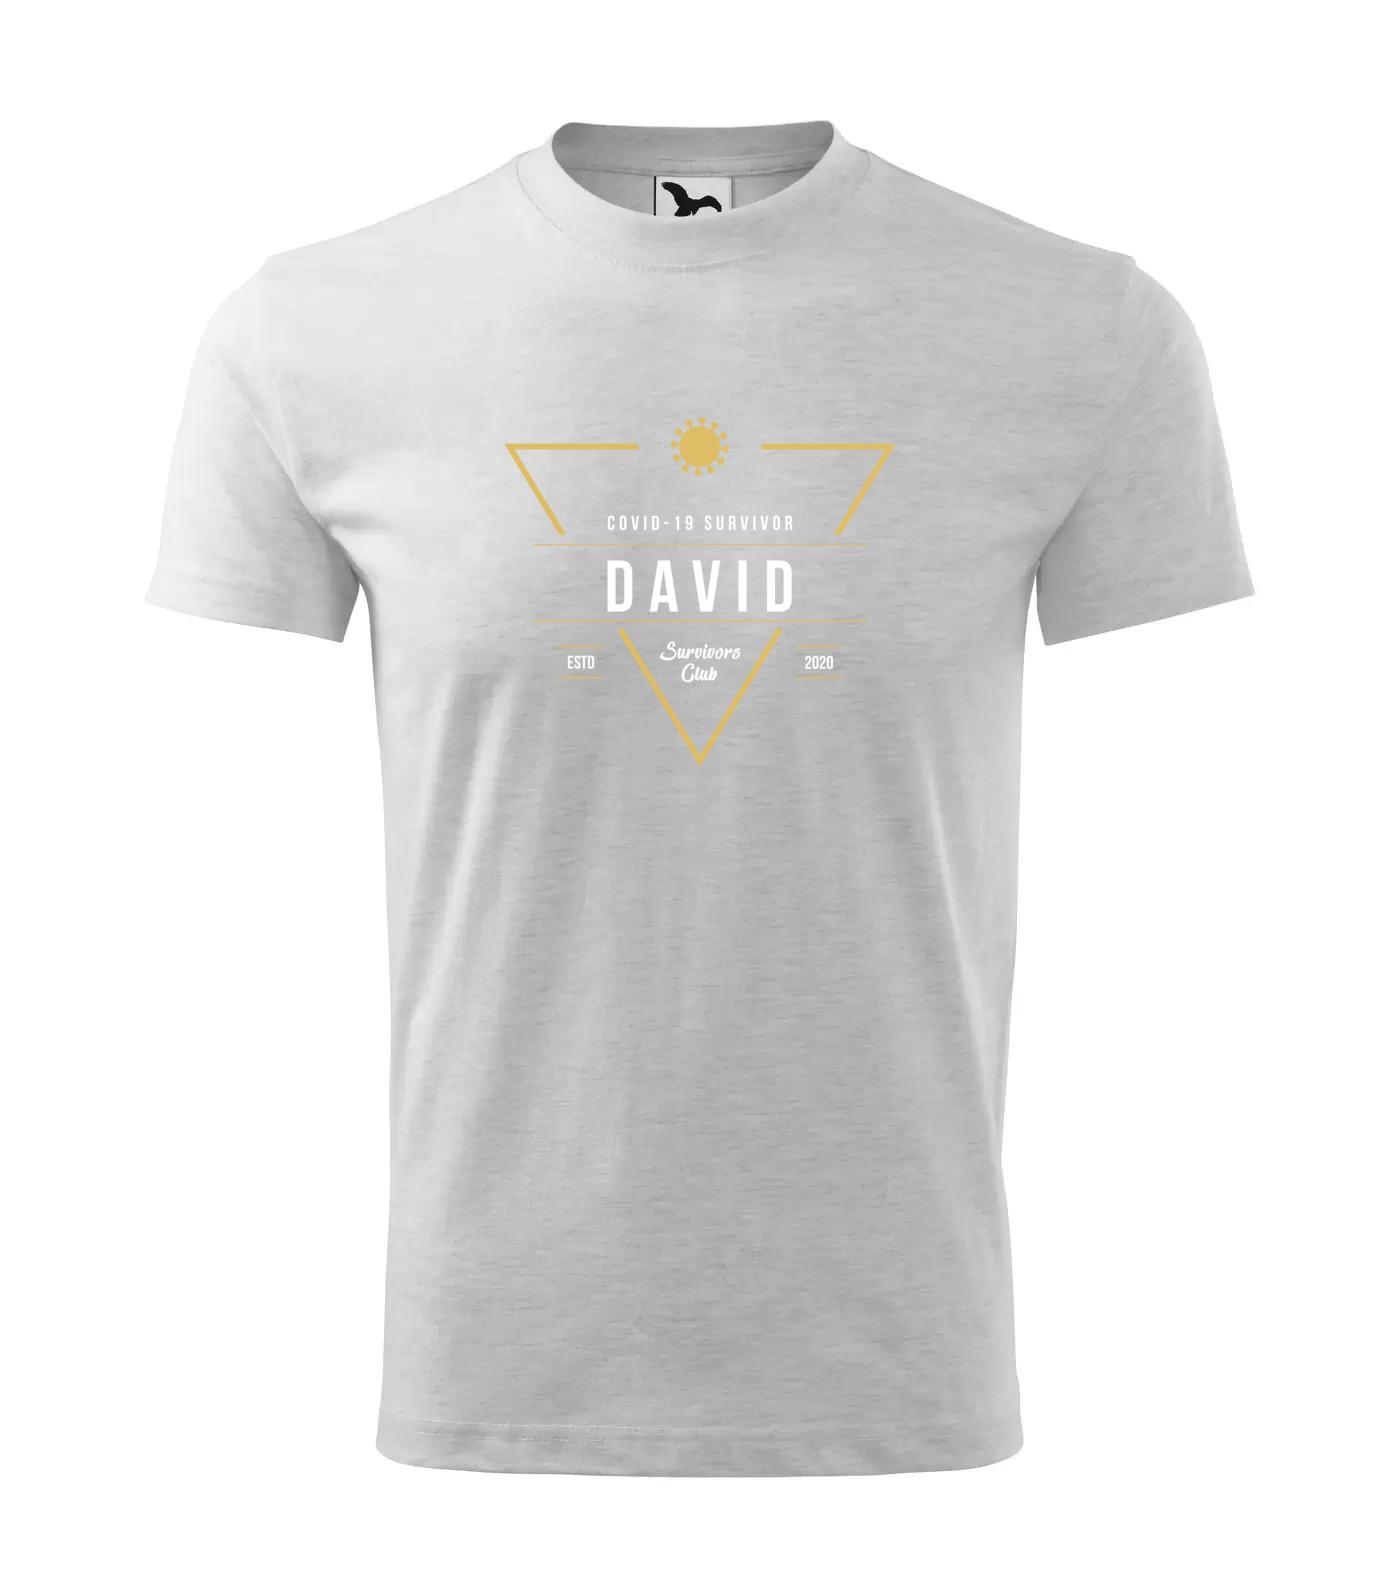 Tričko Survivor Club David